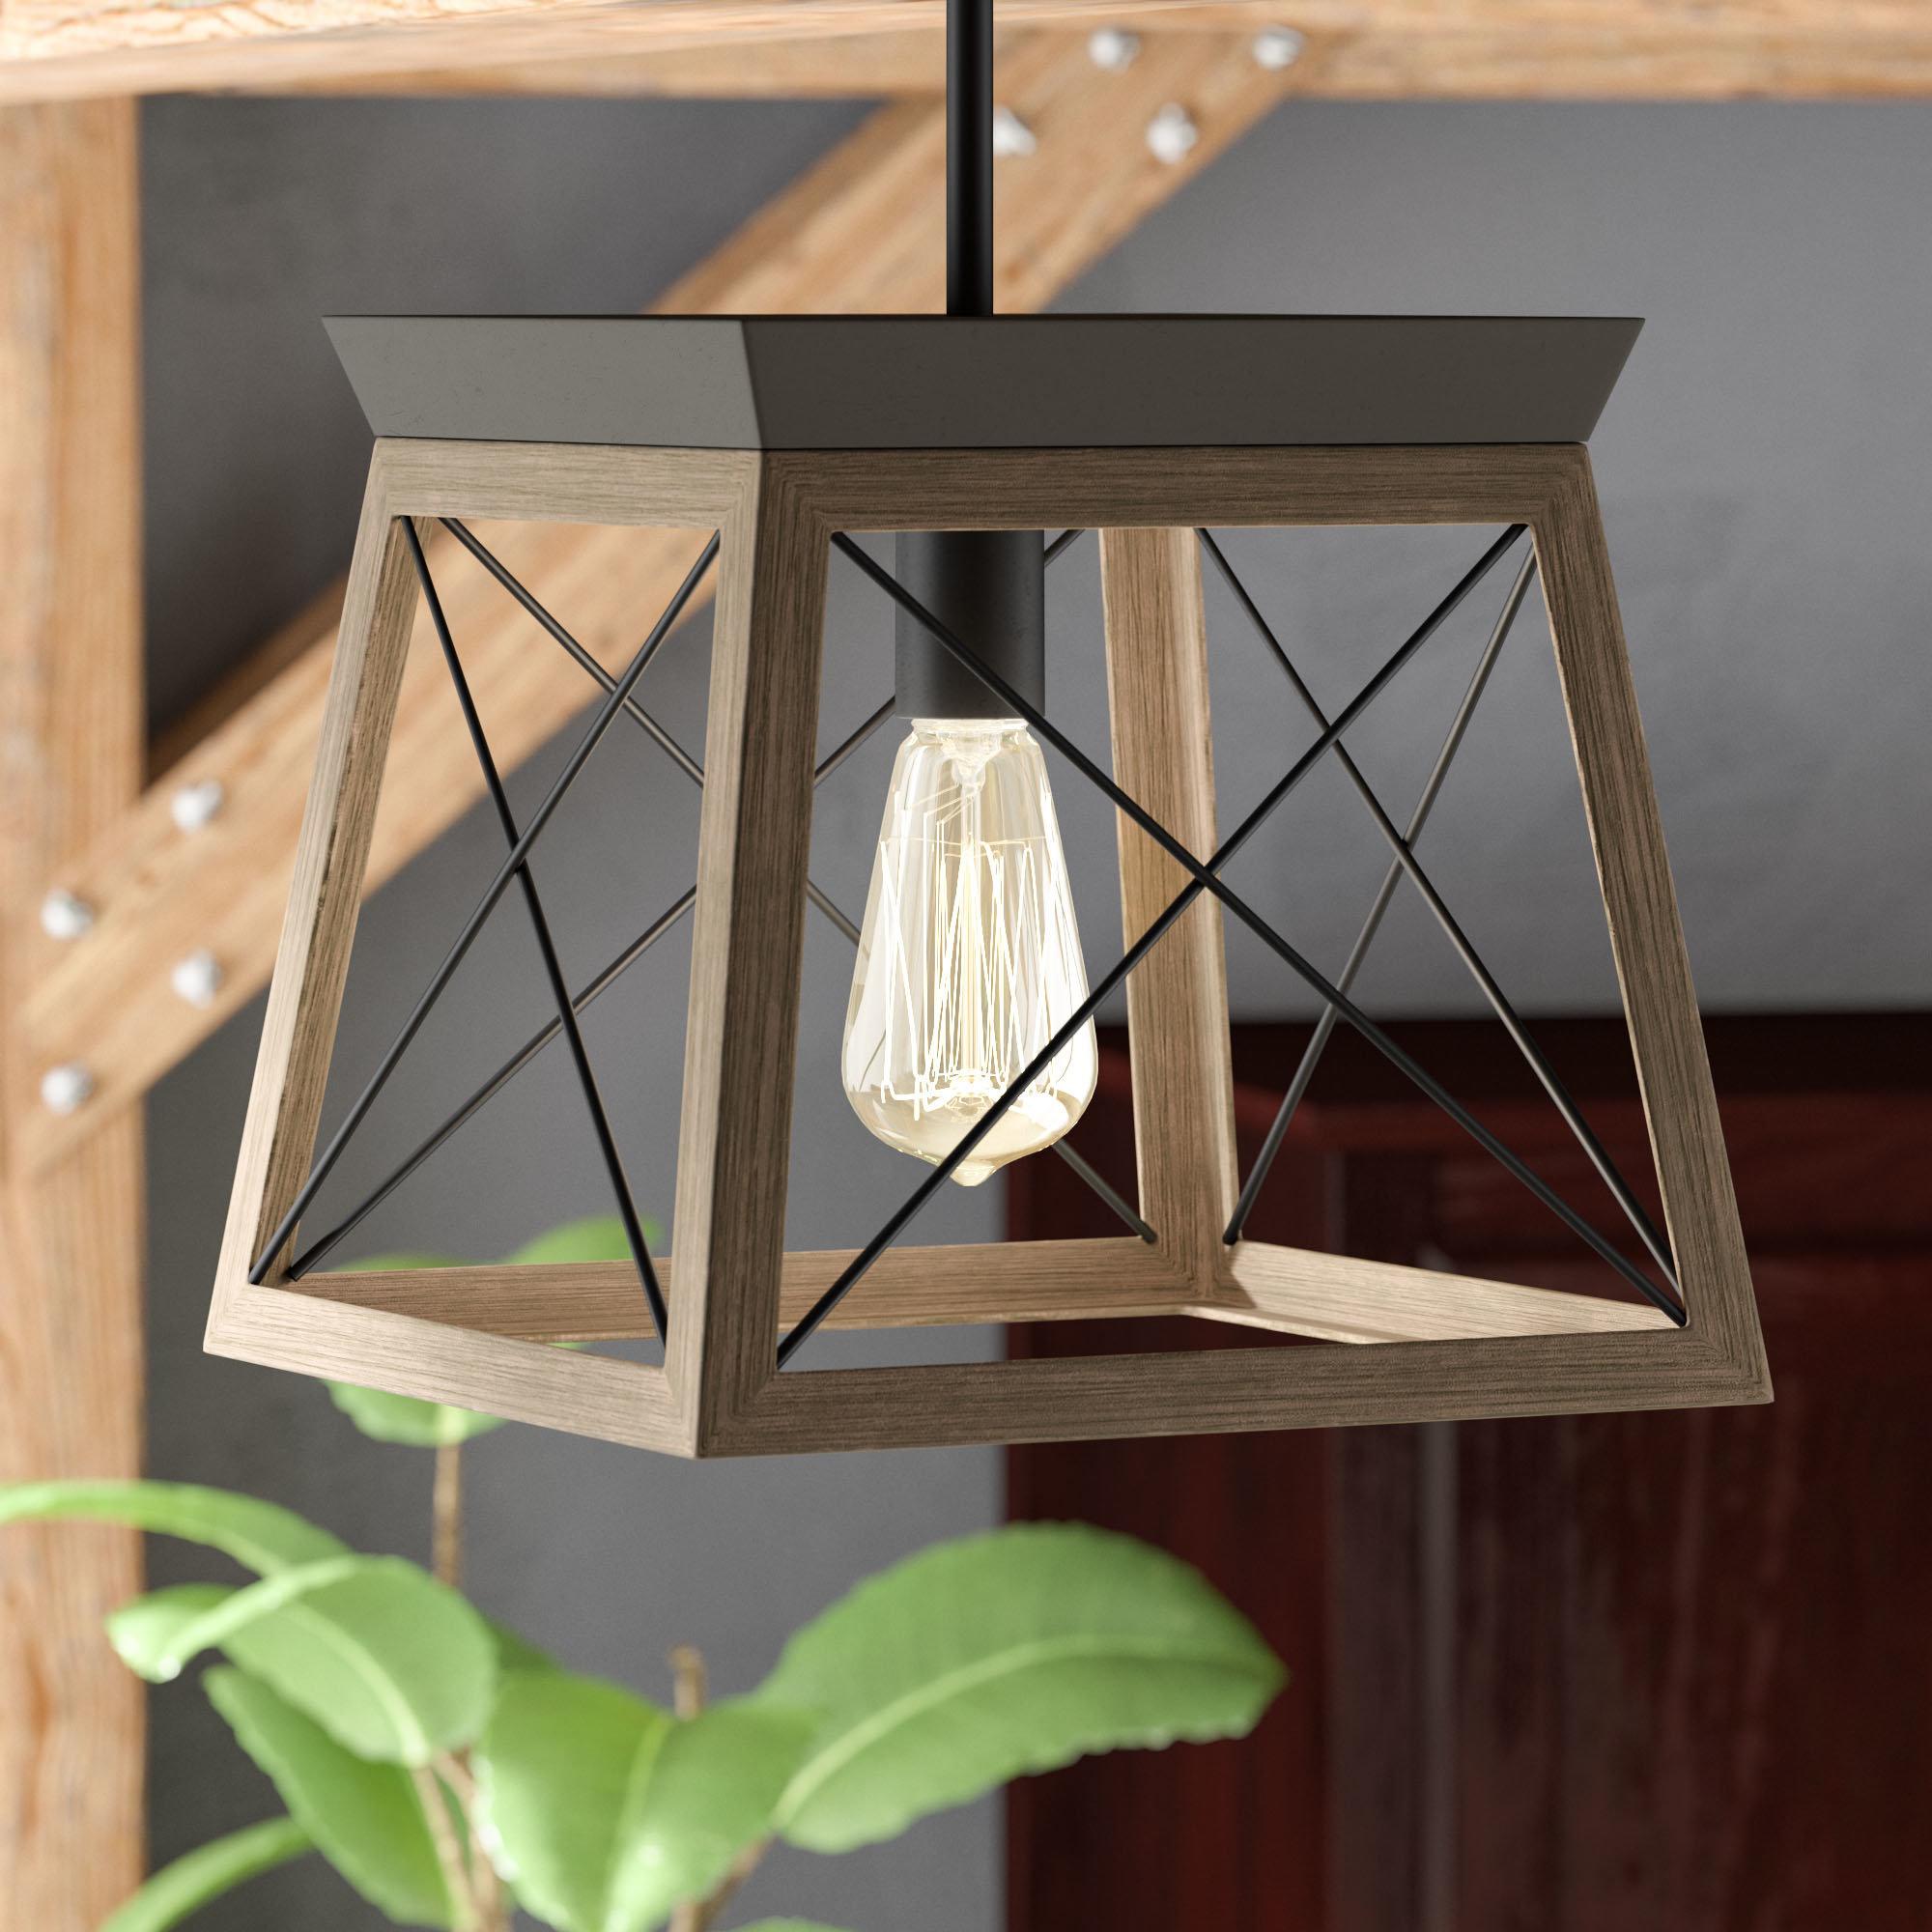 Louanne 3 Light Lantern Geometric Pendants Within 2019 Delon 1 Light Lantern Geometric Pendant (View 13 of 20)